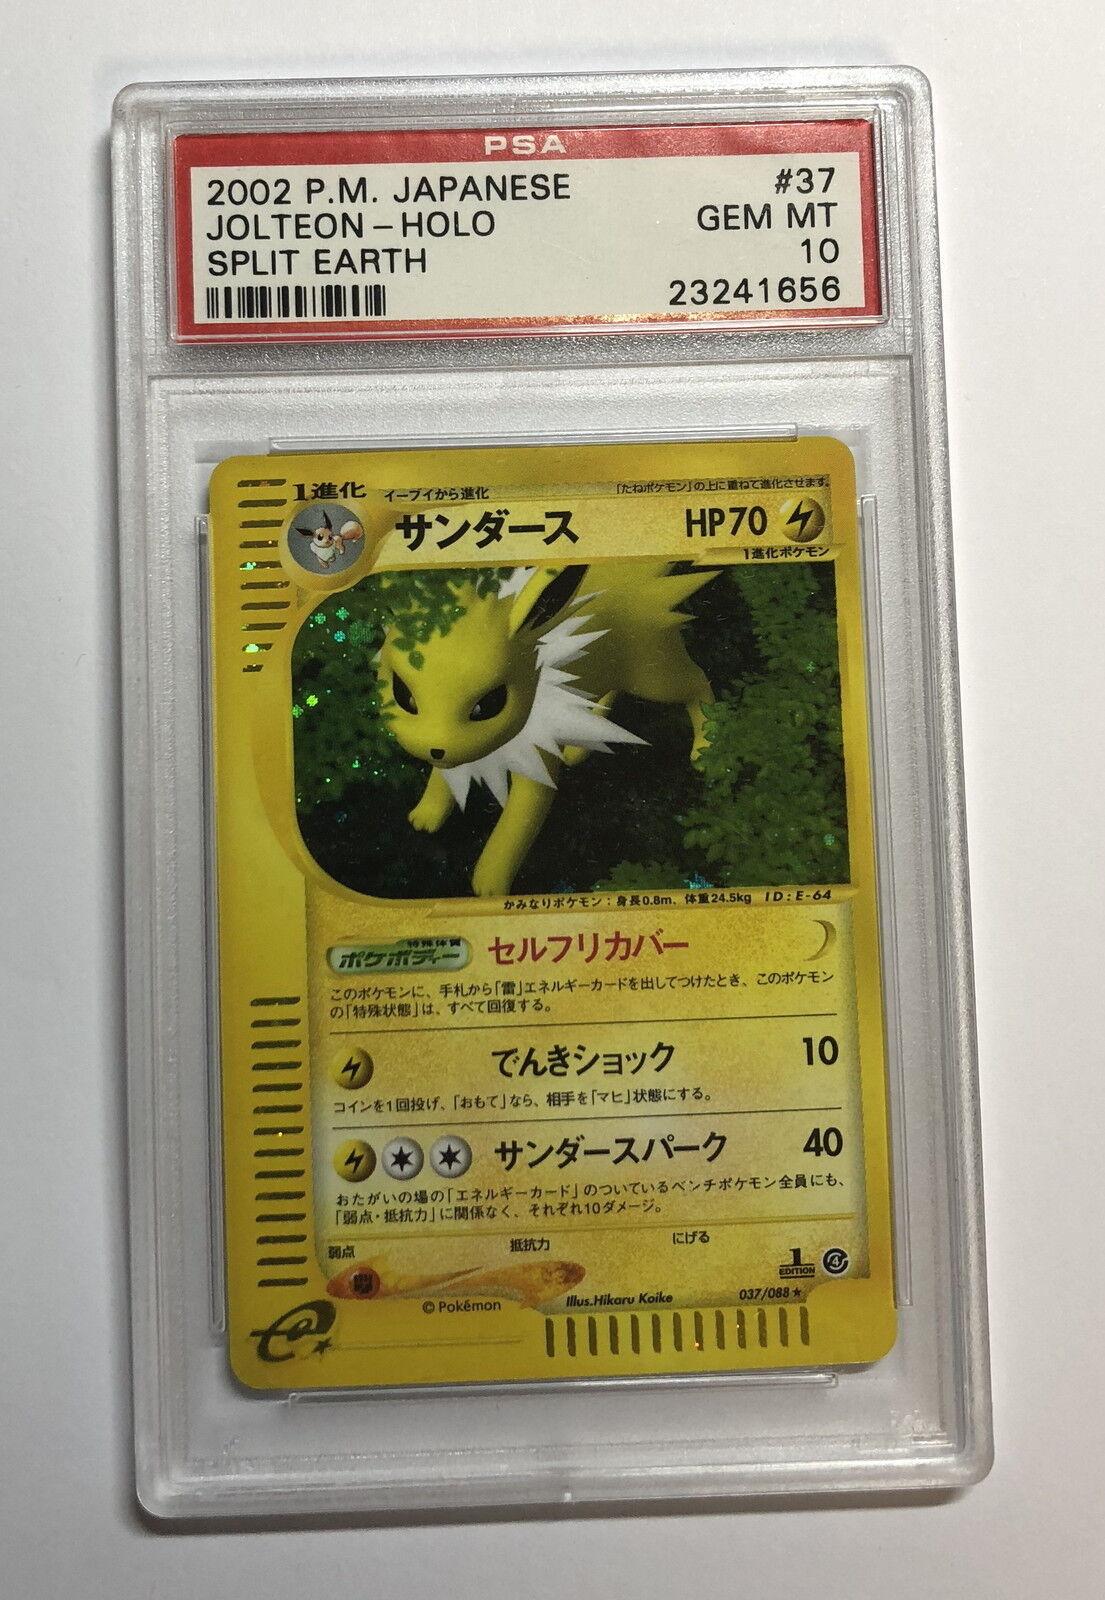 Pokemon PSA 10 GEM MINT Jolteon Holofoil E4 Split Earth Skyridge Japanese 1st Ed